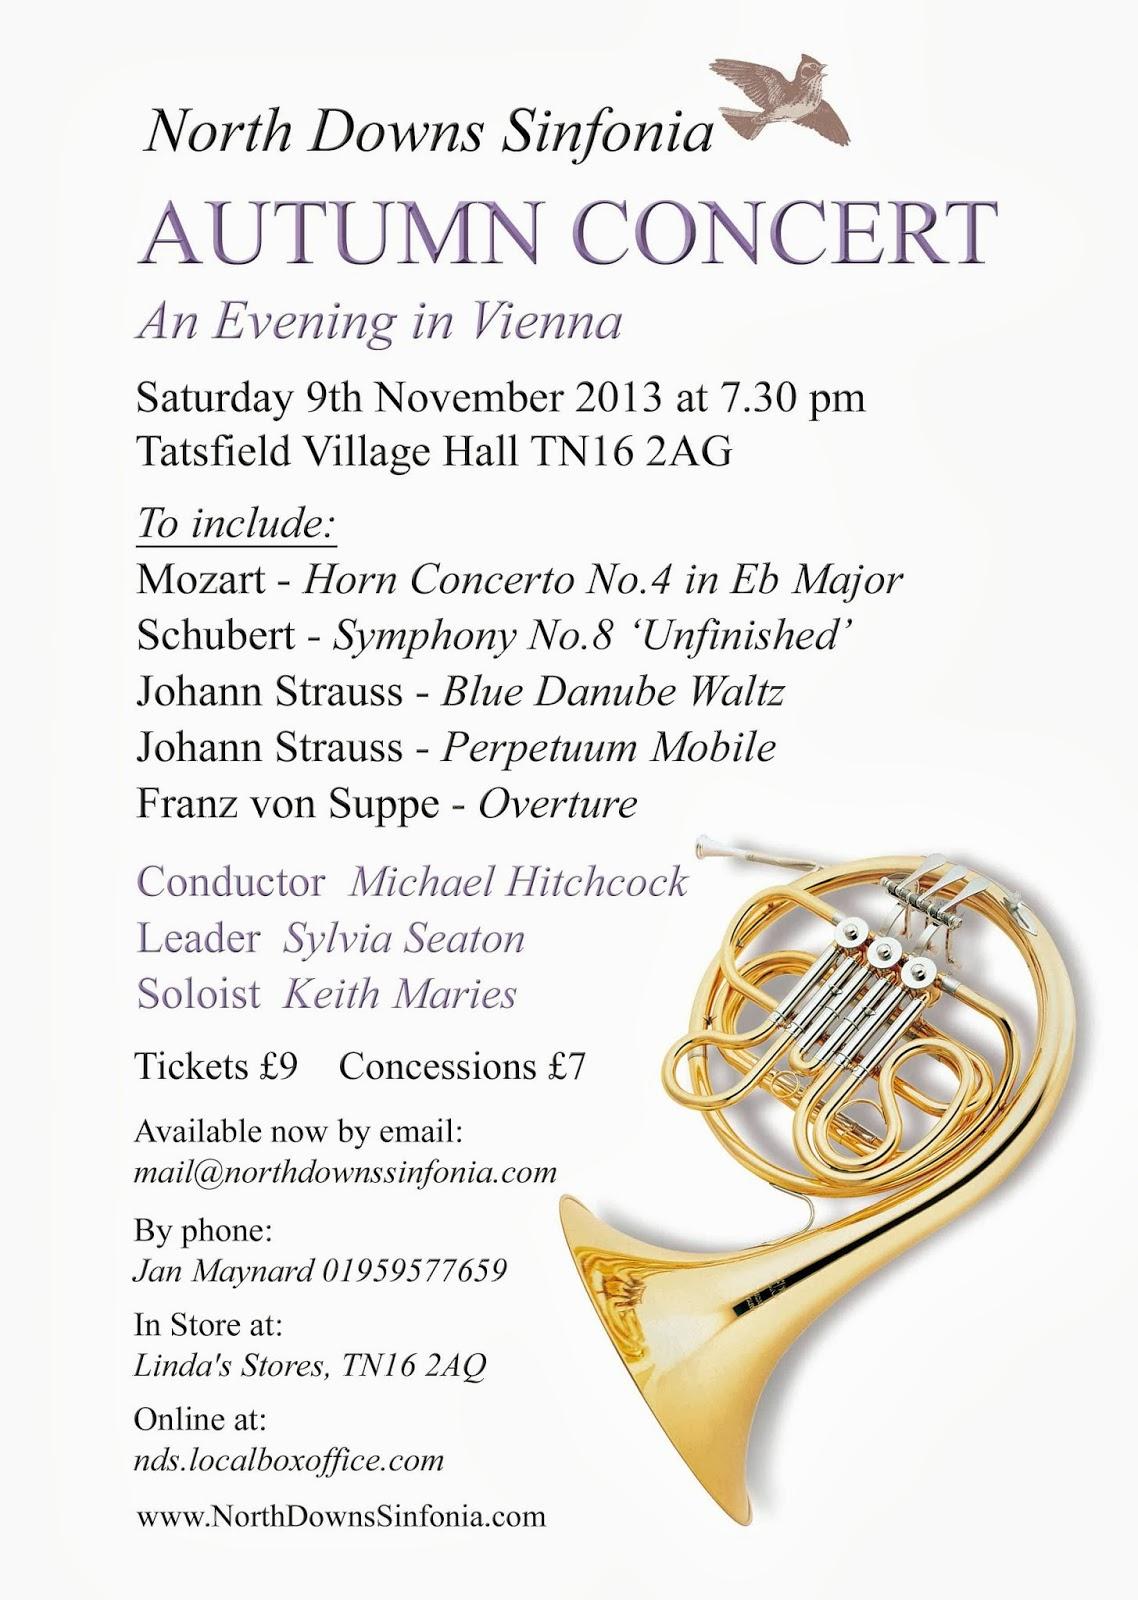 2013 autumn concert poster